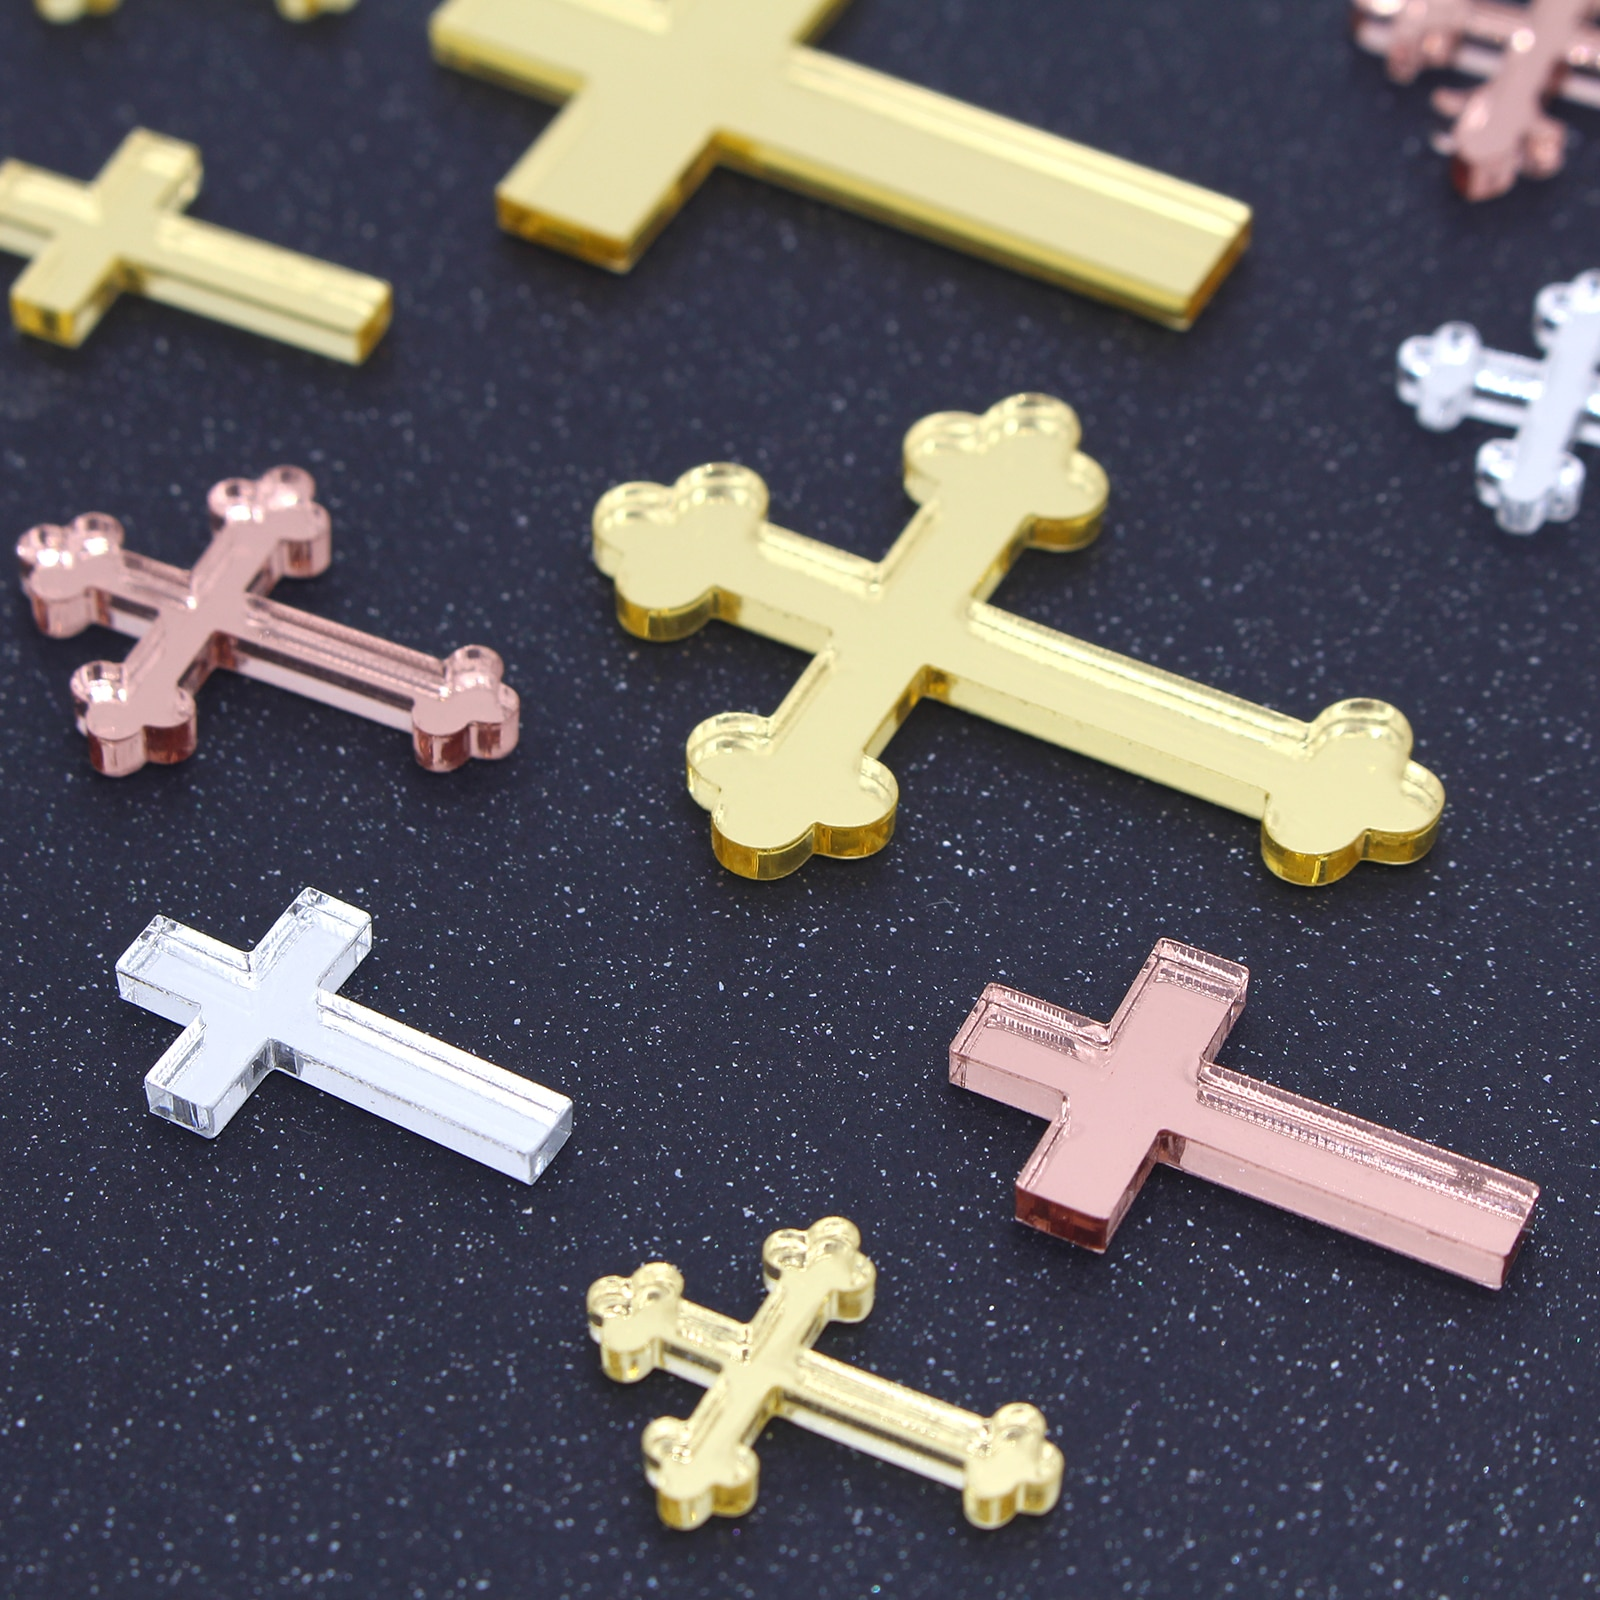 12 Pcs Personalisierte Gold Silber Kreuz Taufe Kerze Dekoration Taufe Kerze Kreuz Viele größe Kreuze Pins für Kerzen